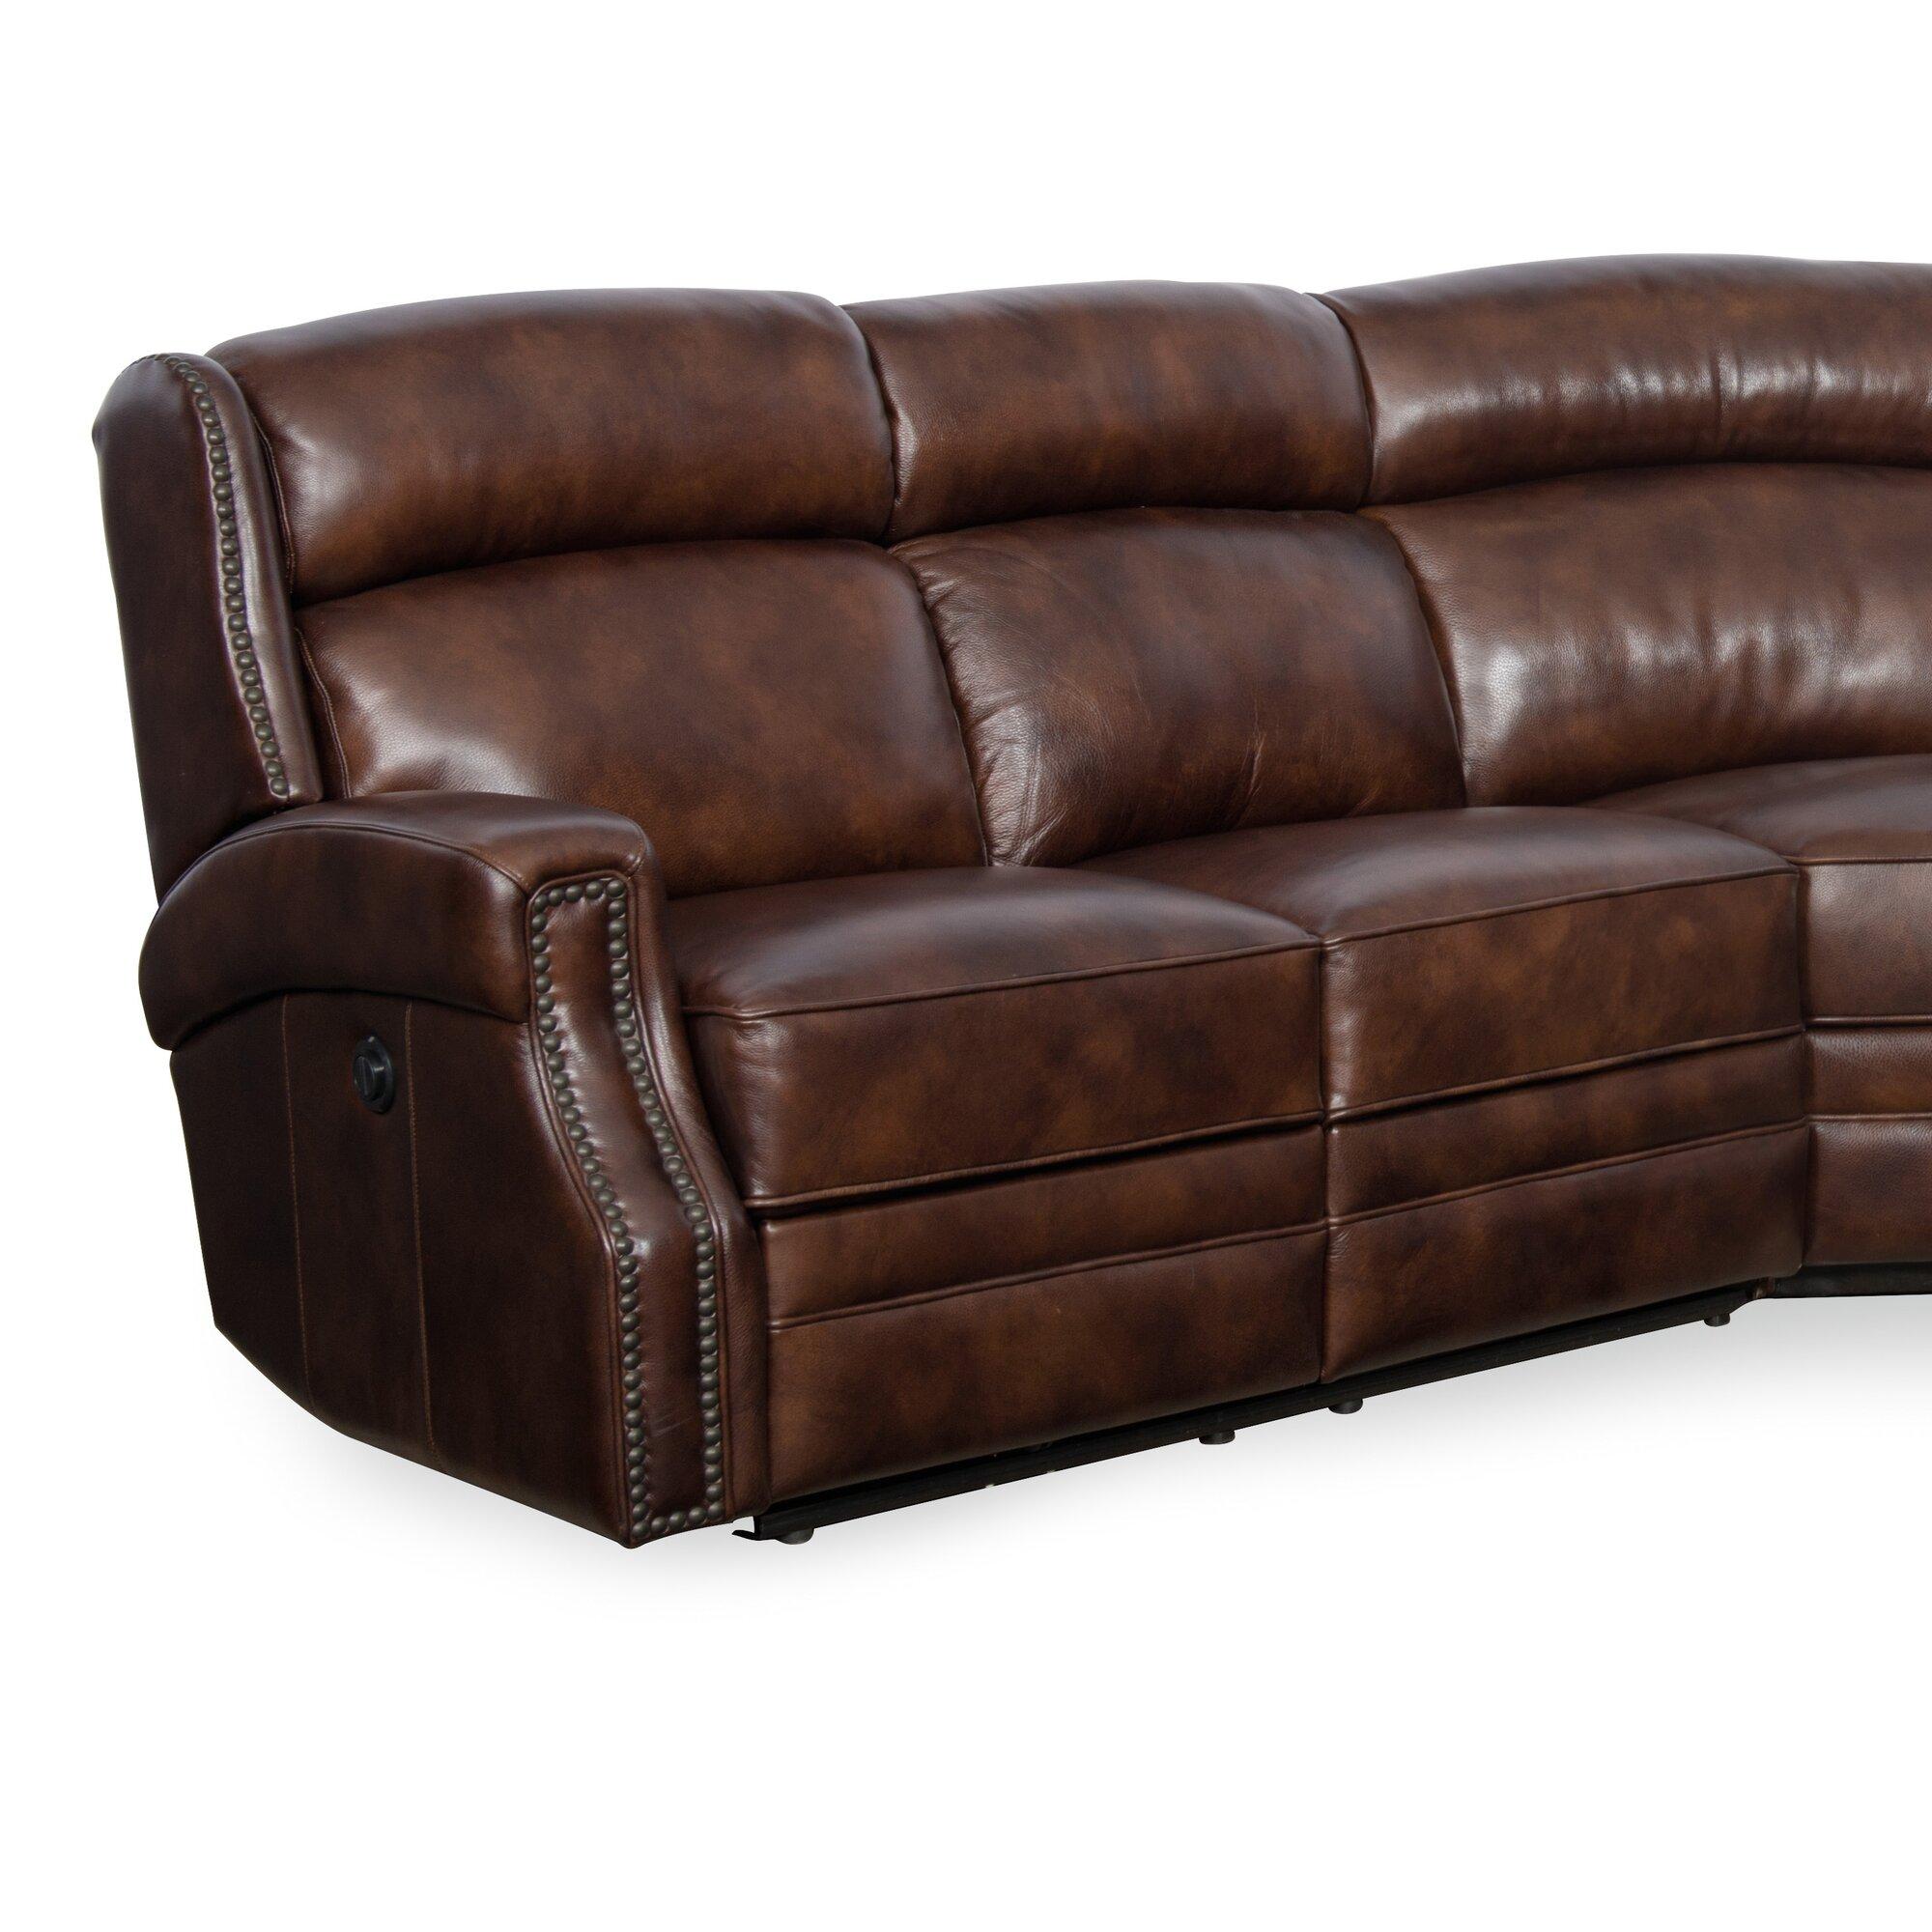 Hooker Furniture Carlisle Leather Laf Power Motion